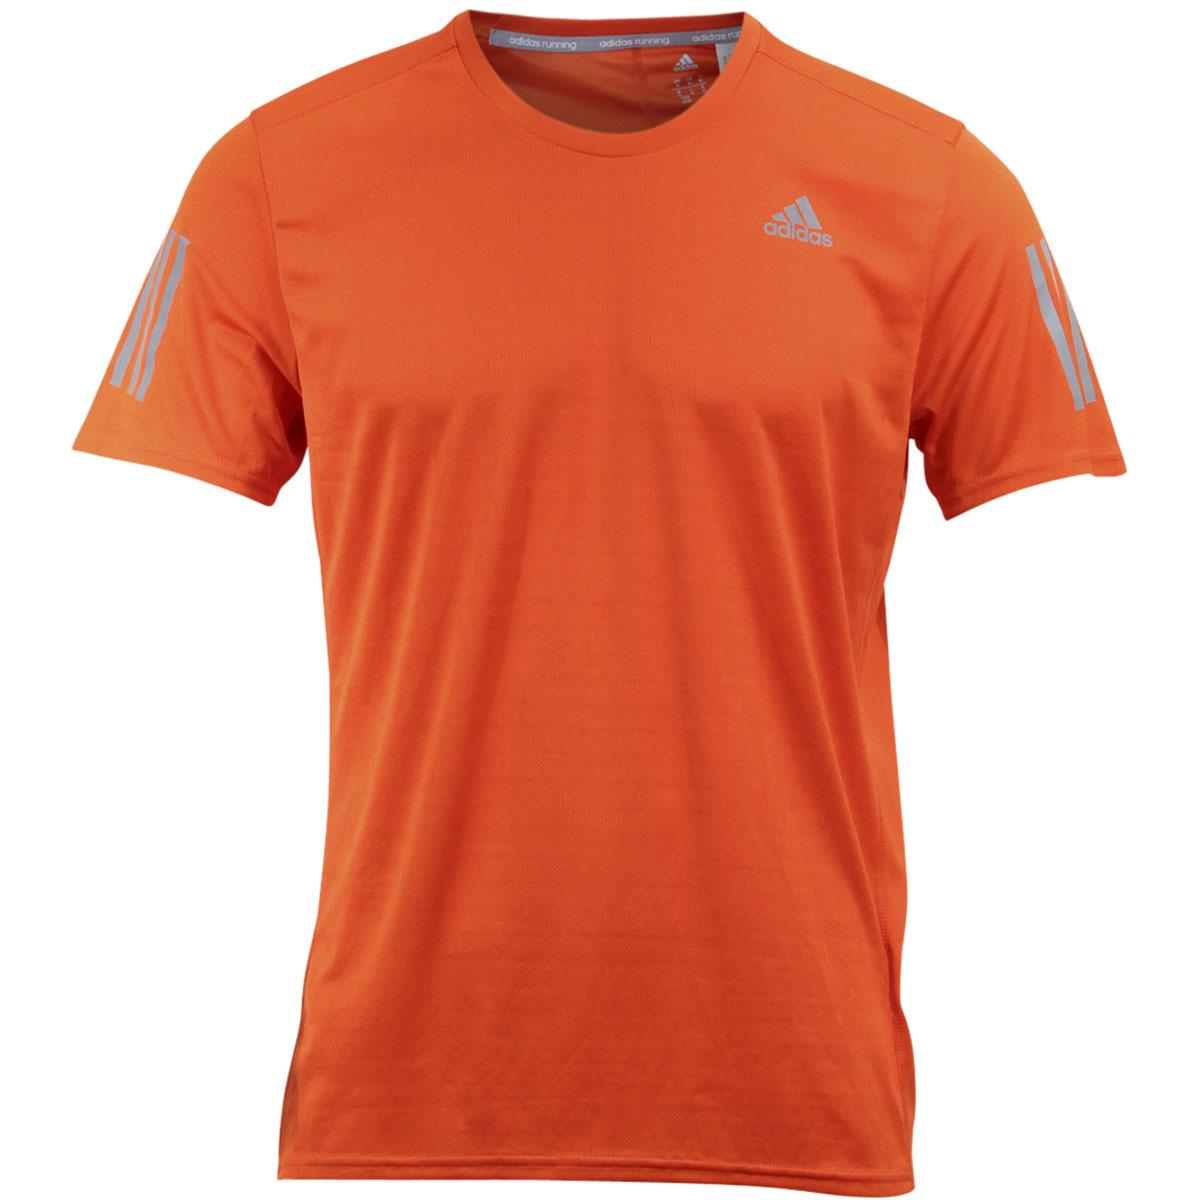 Image of Adidas Men's Response Trail Running Climacool Short Sleeve T Shirt - Energy - X Large